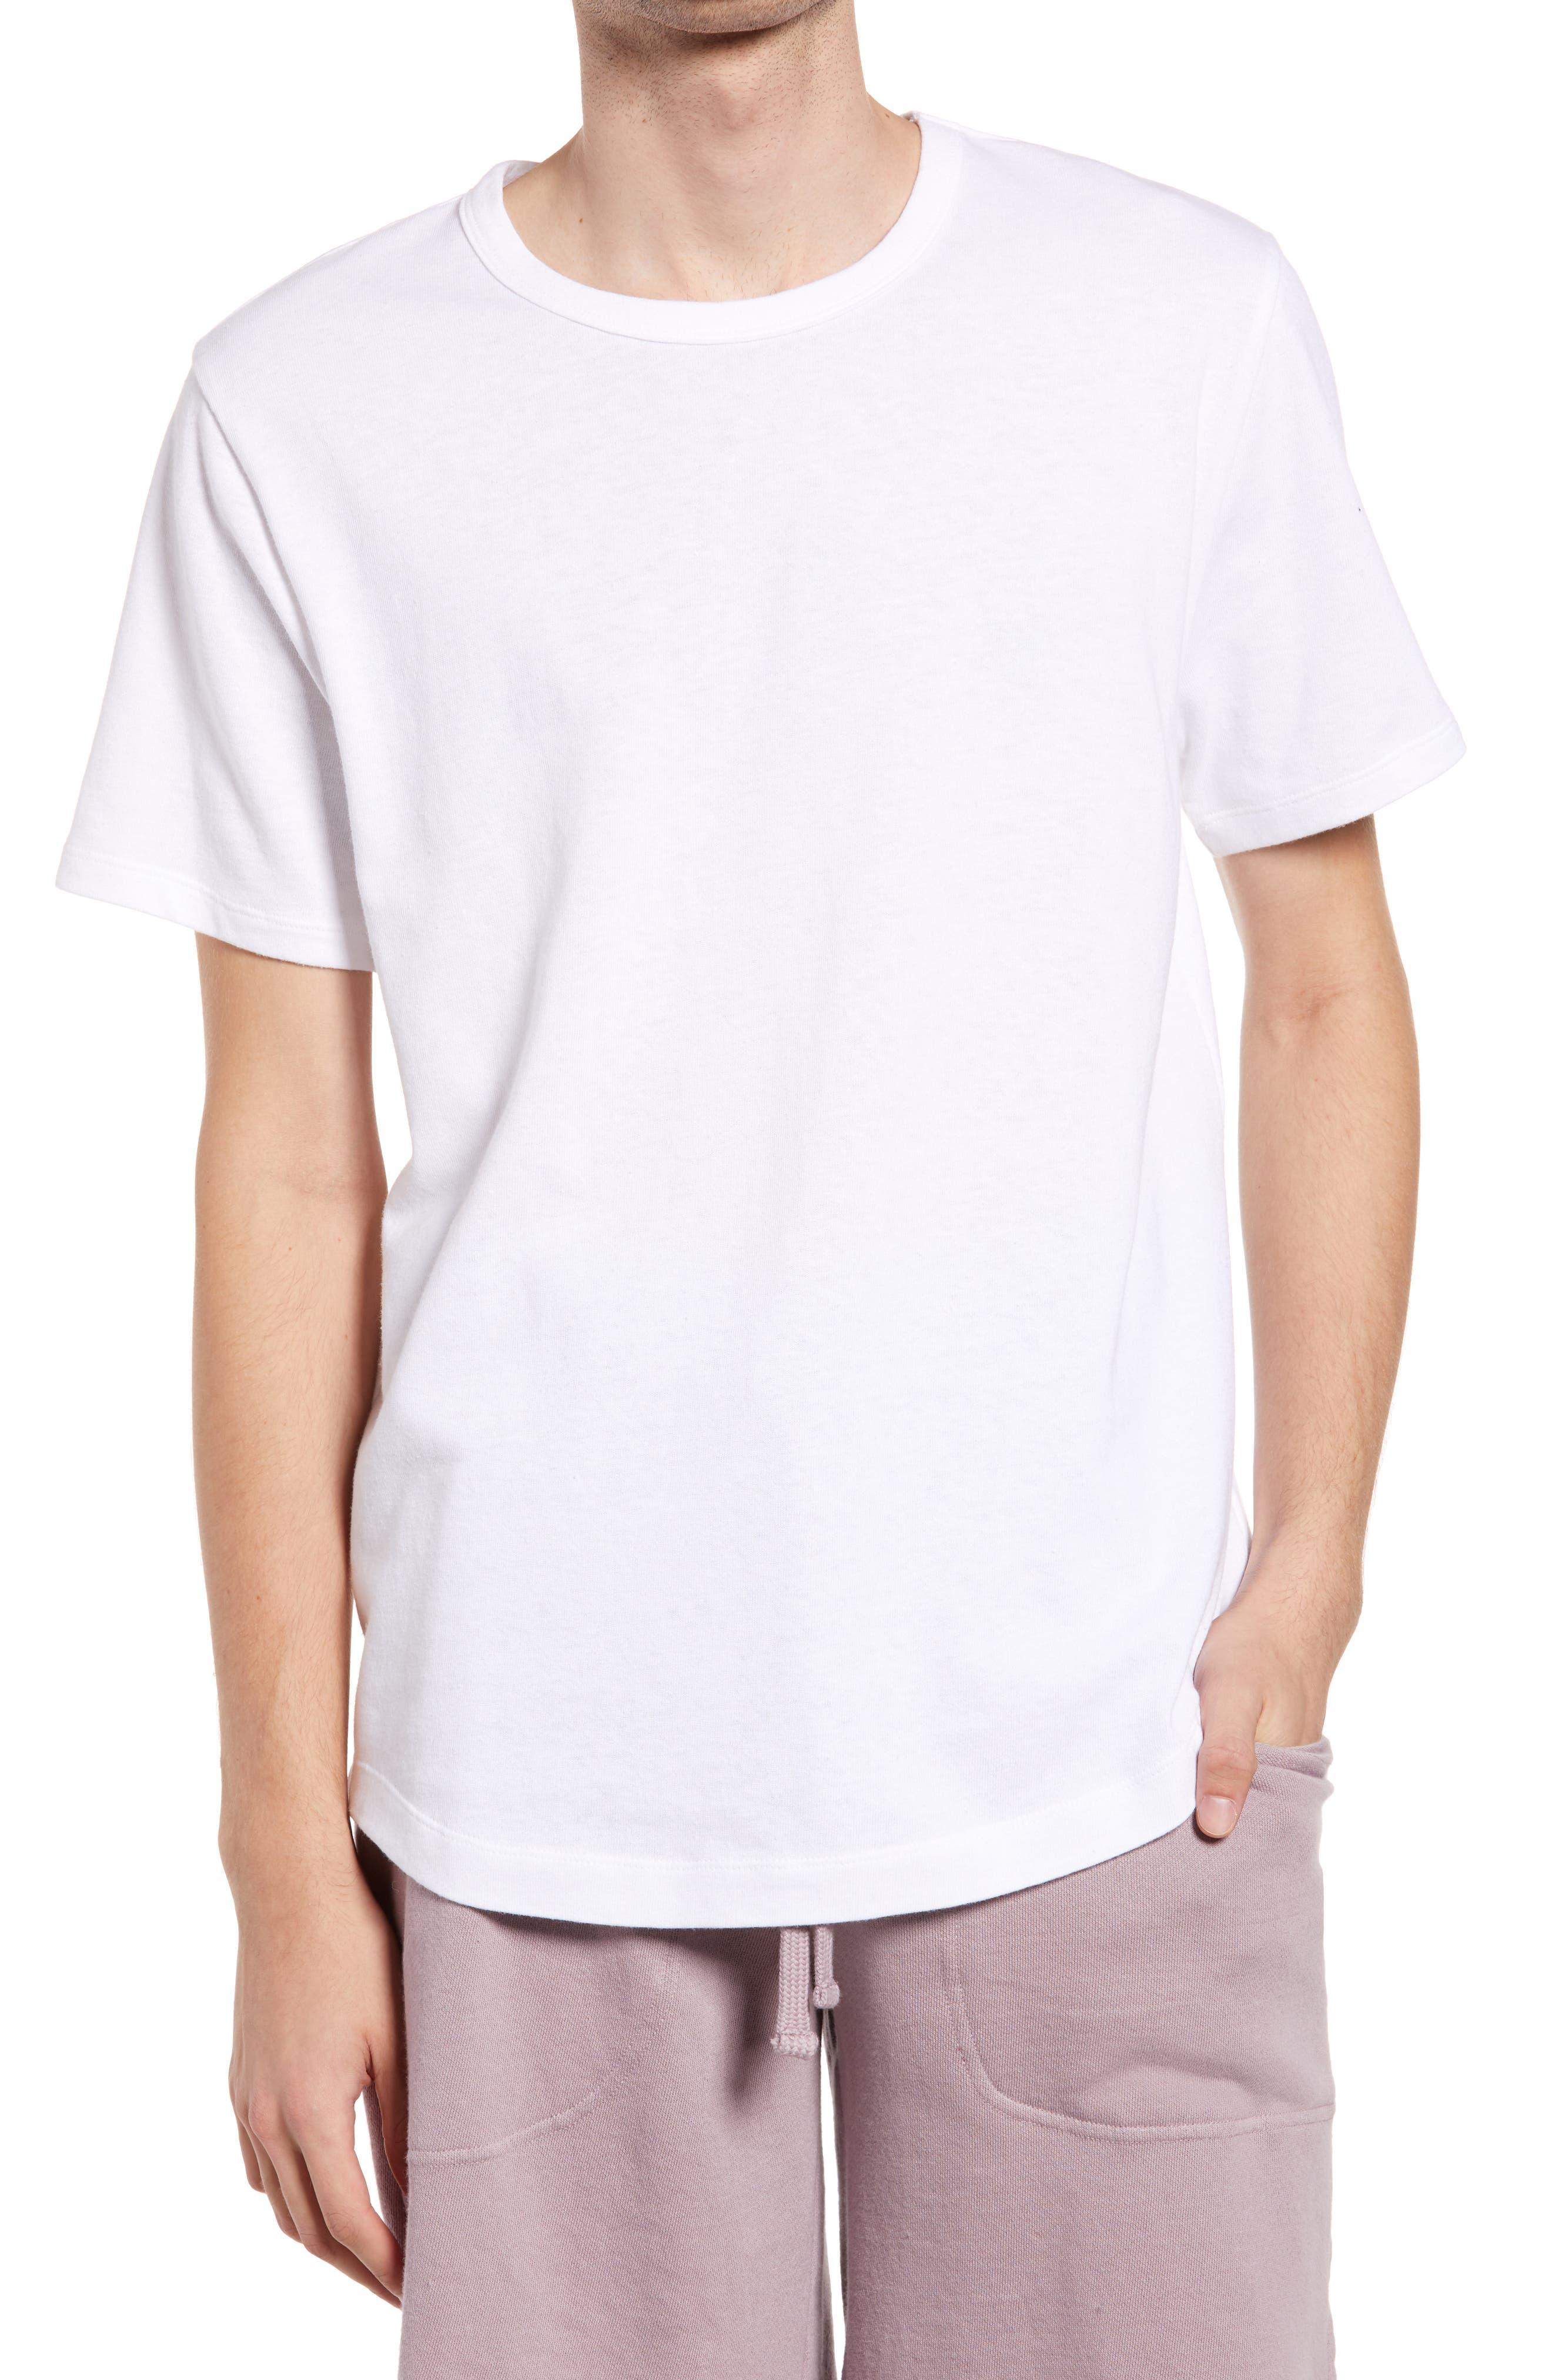 Men's Cotton & Hemp Sleep T-Shirt